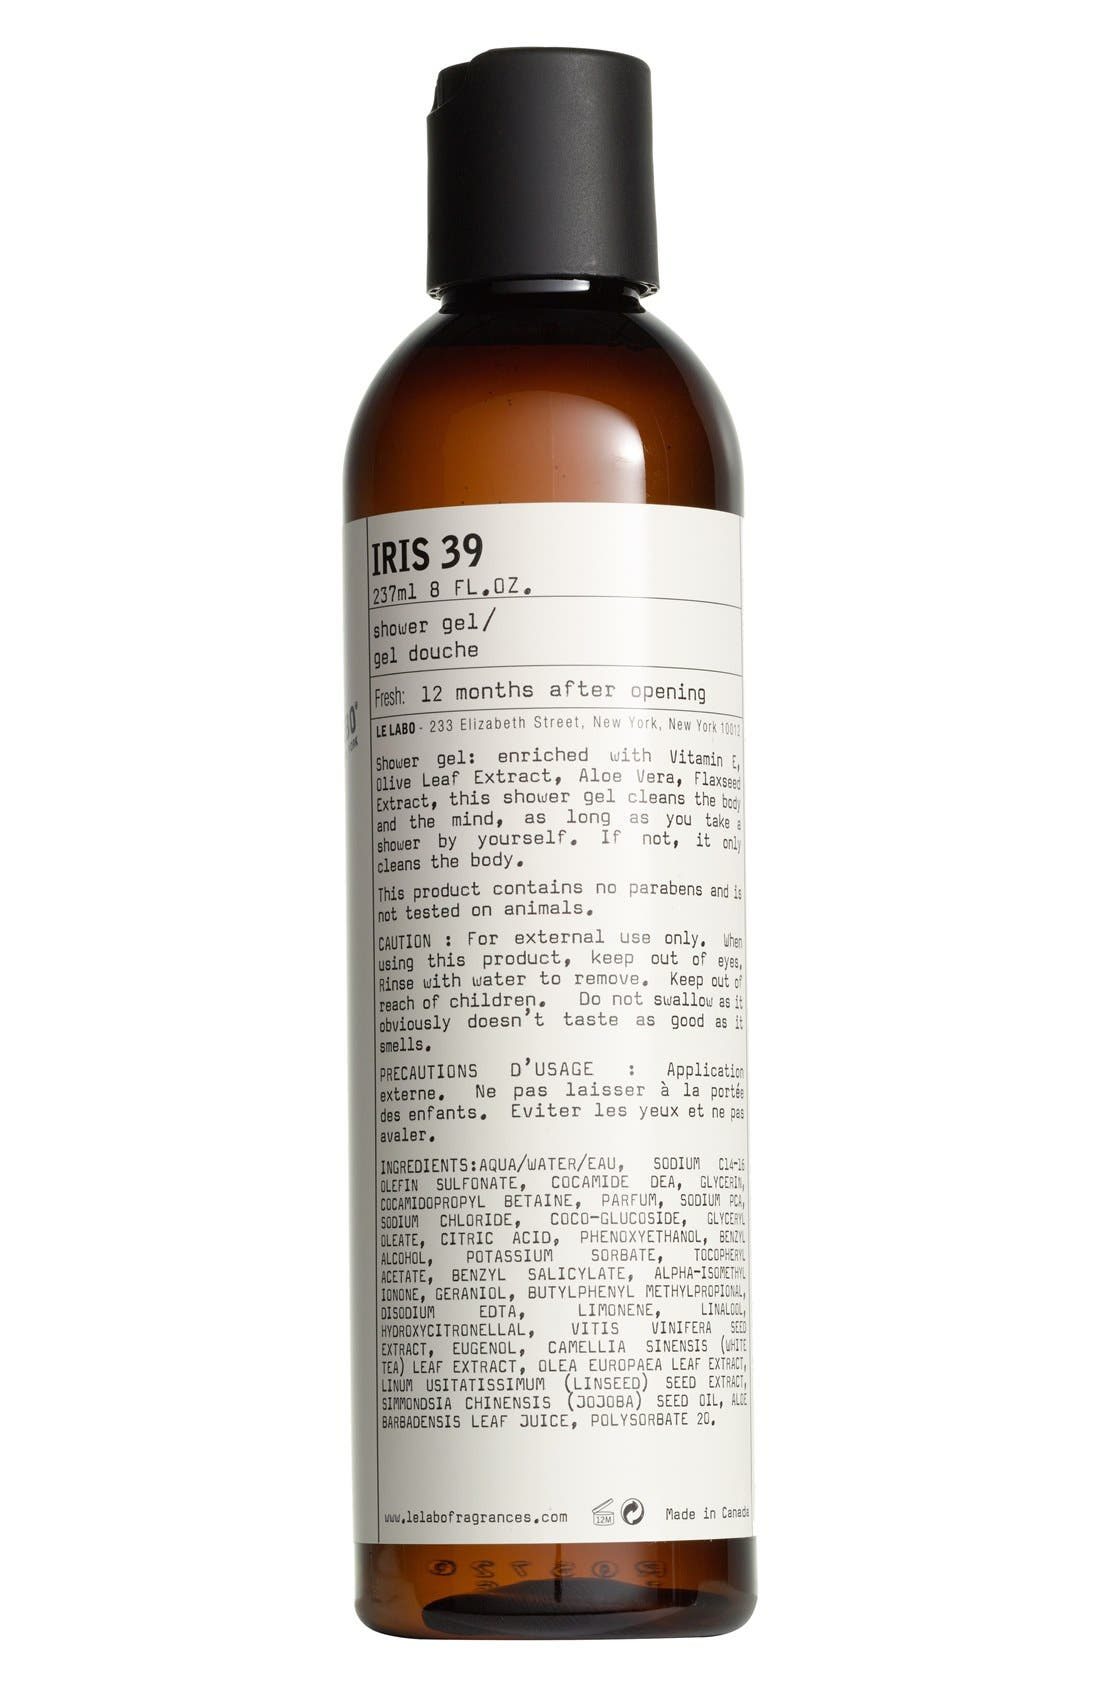 Iris 39 Shower Gel